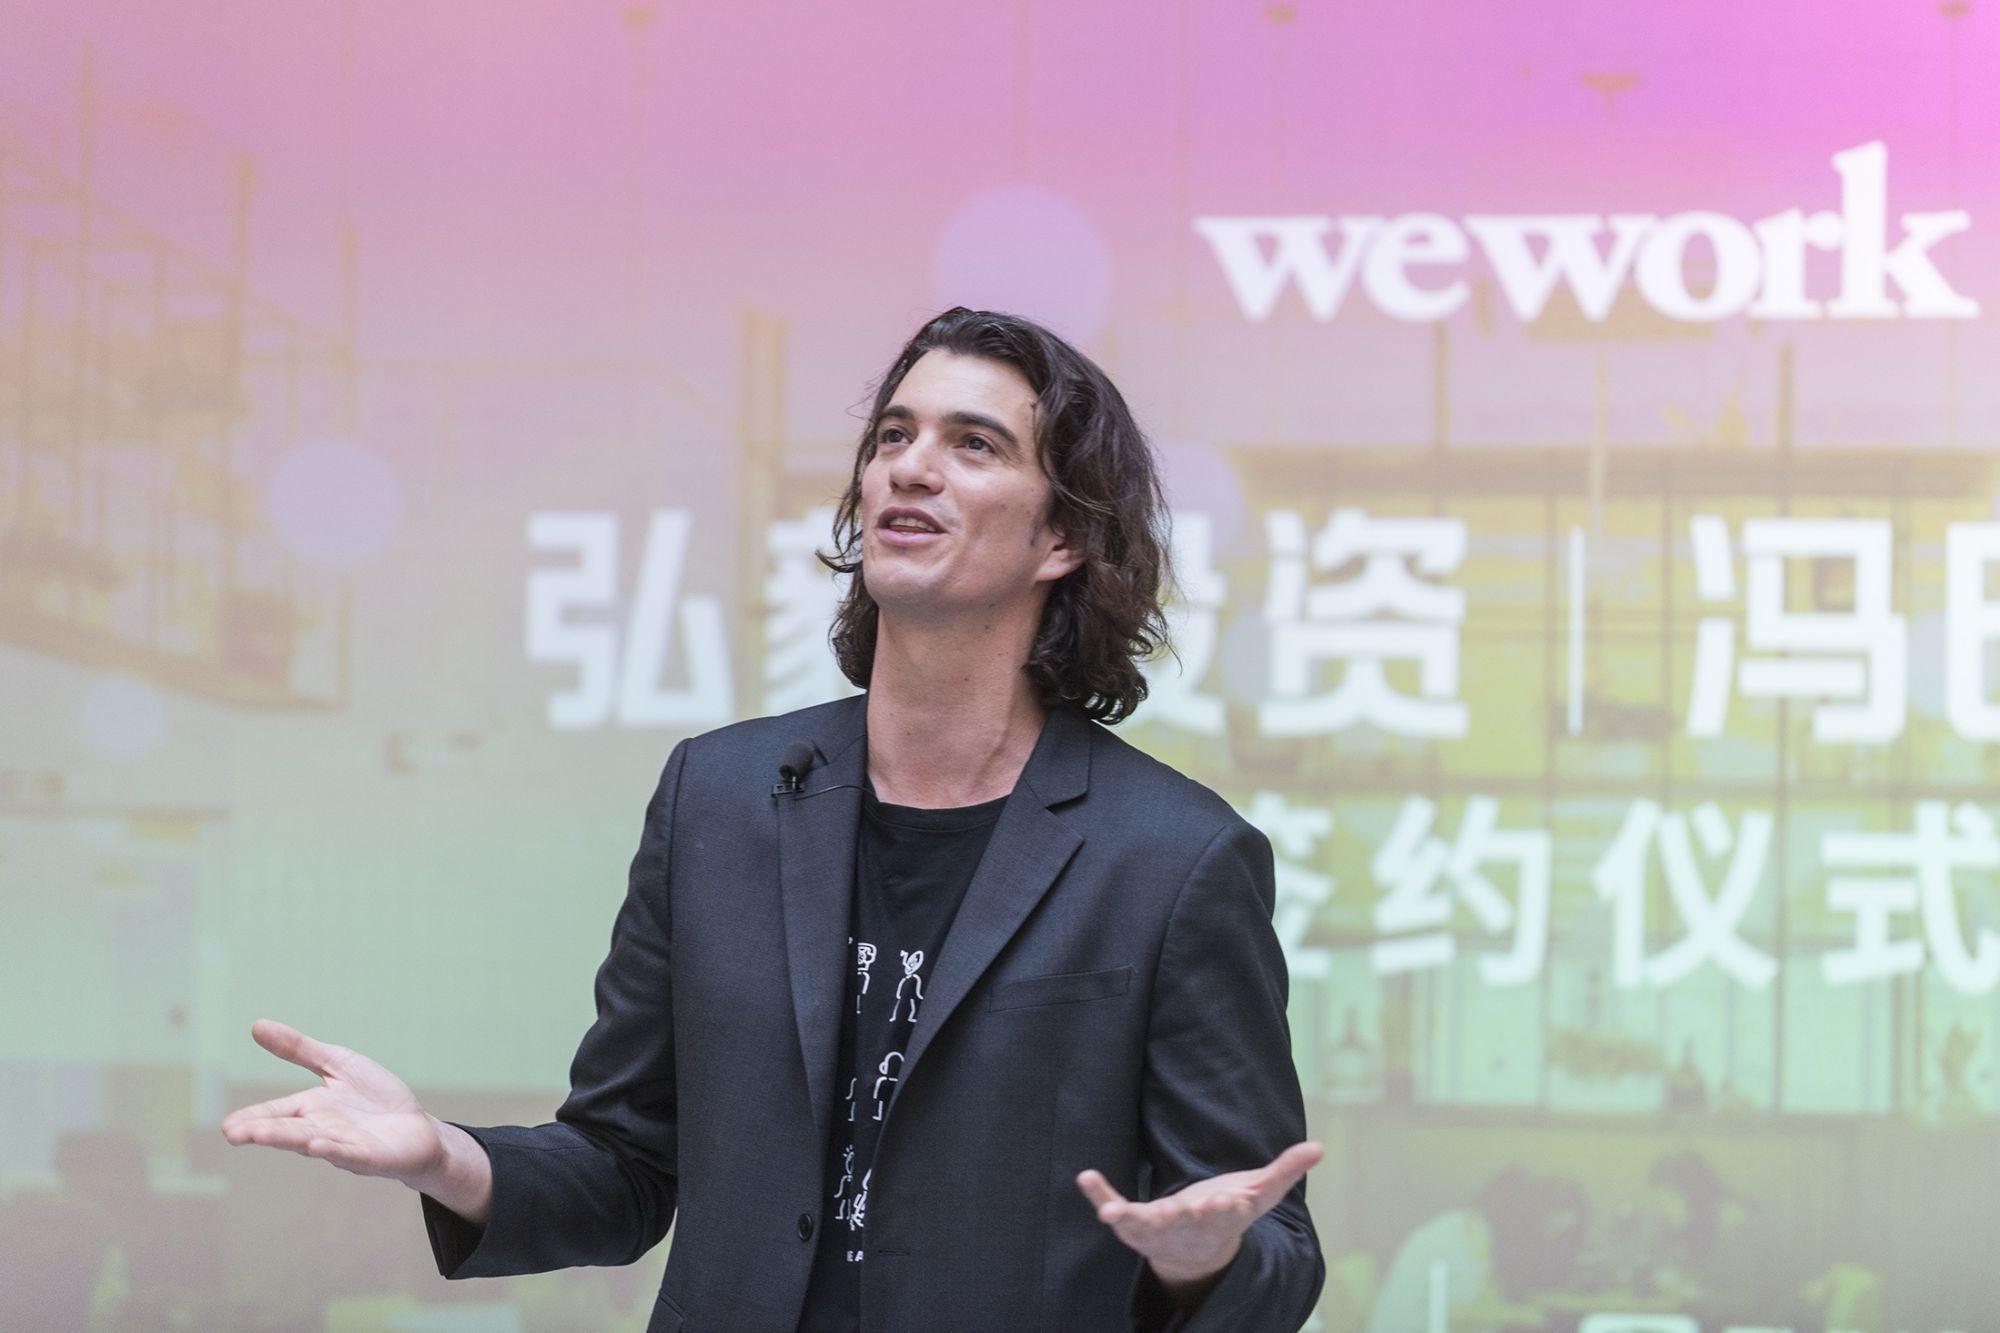 Why Did WeWork's Adam Neumann